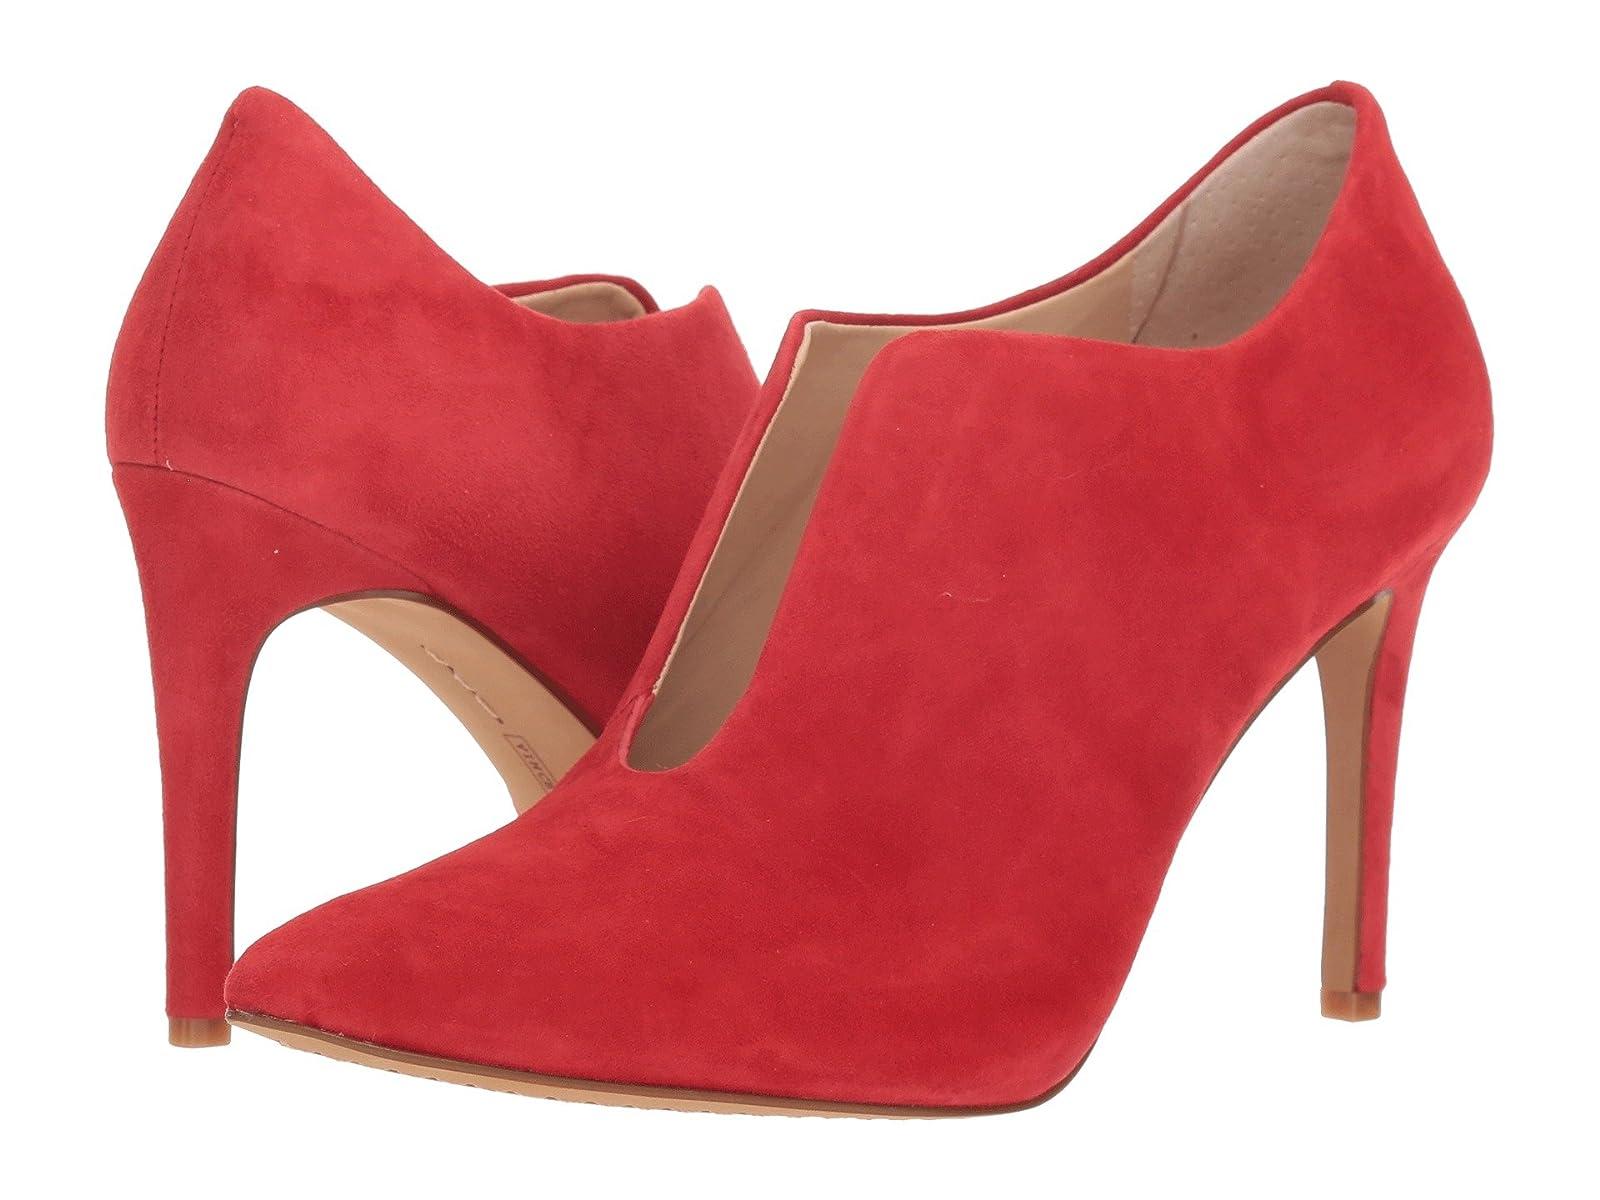 Vince Camuto MetseyaAtmospheric grades have affordable shoes